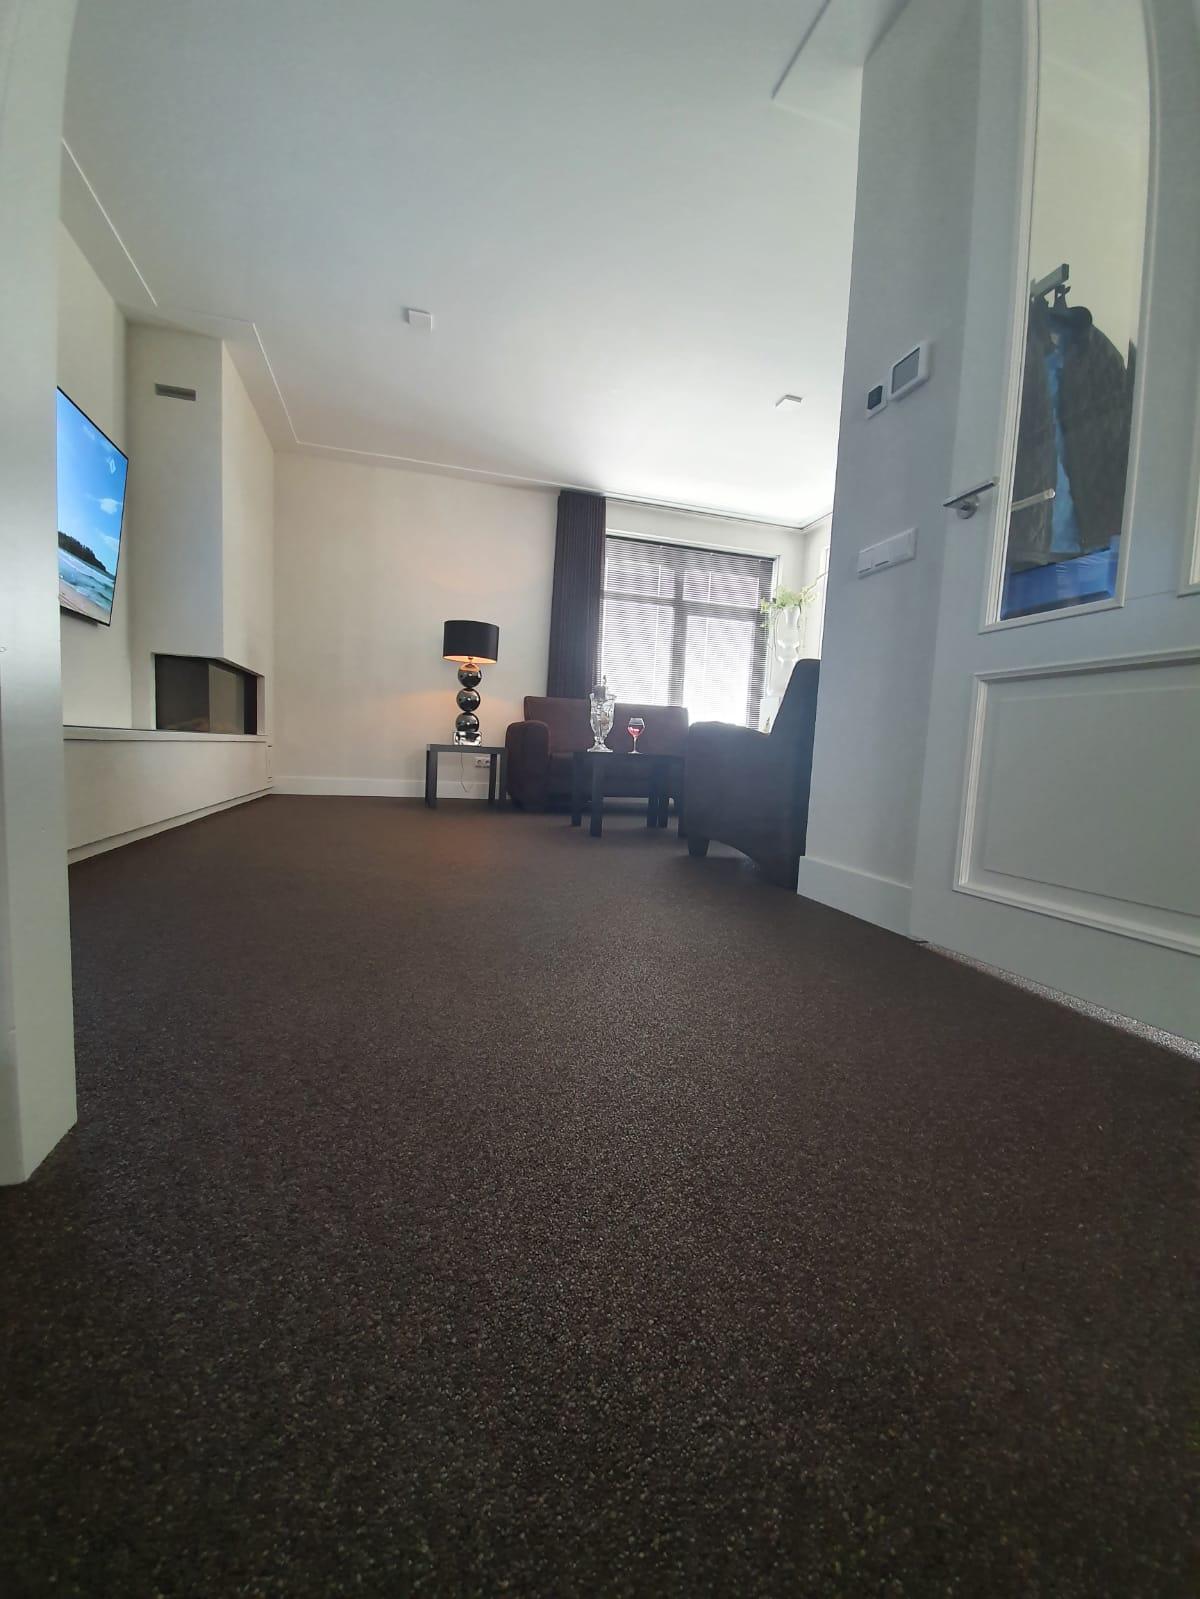 Siergrindvloer voor Best en omgeving 2 | Van Tol Vloeren